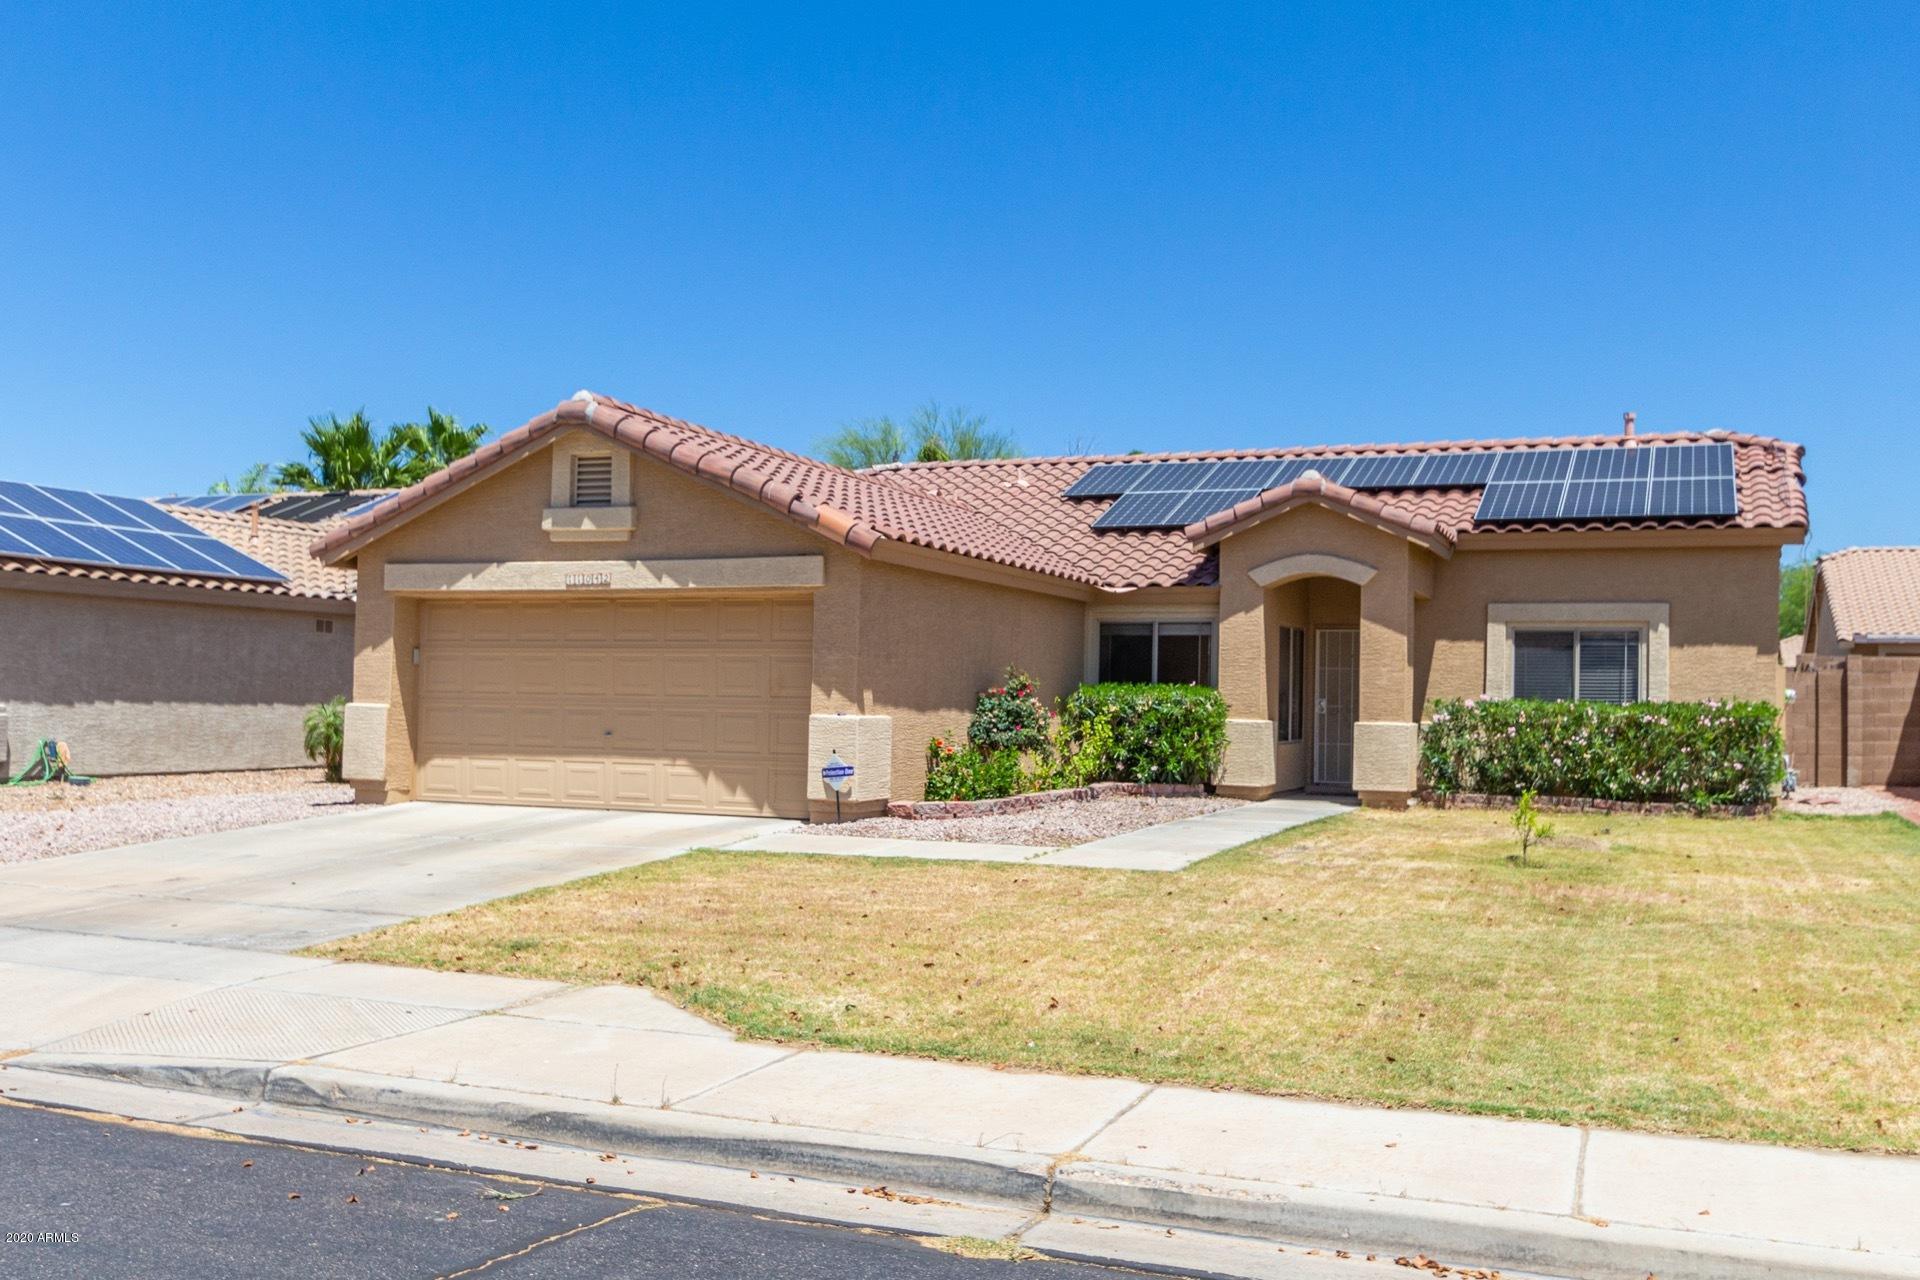 Photo of 11042 E Diamond Avenue, Mesa, AZ 85208